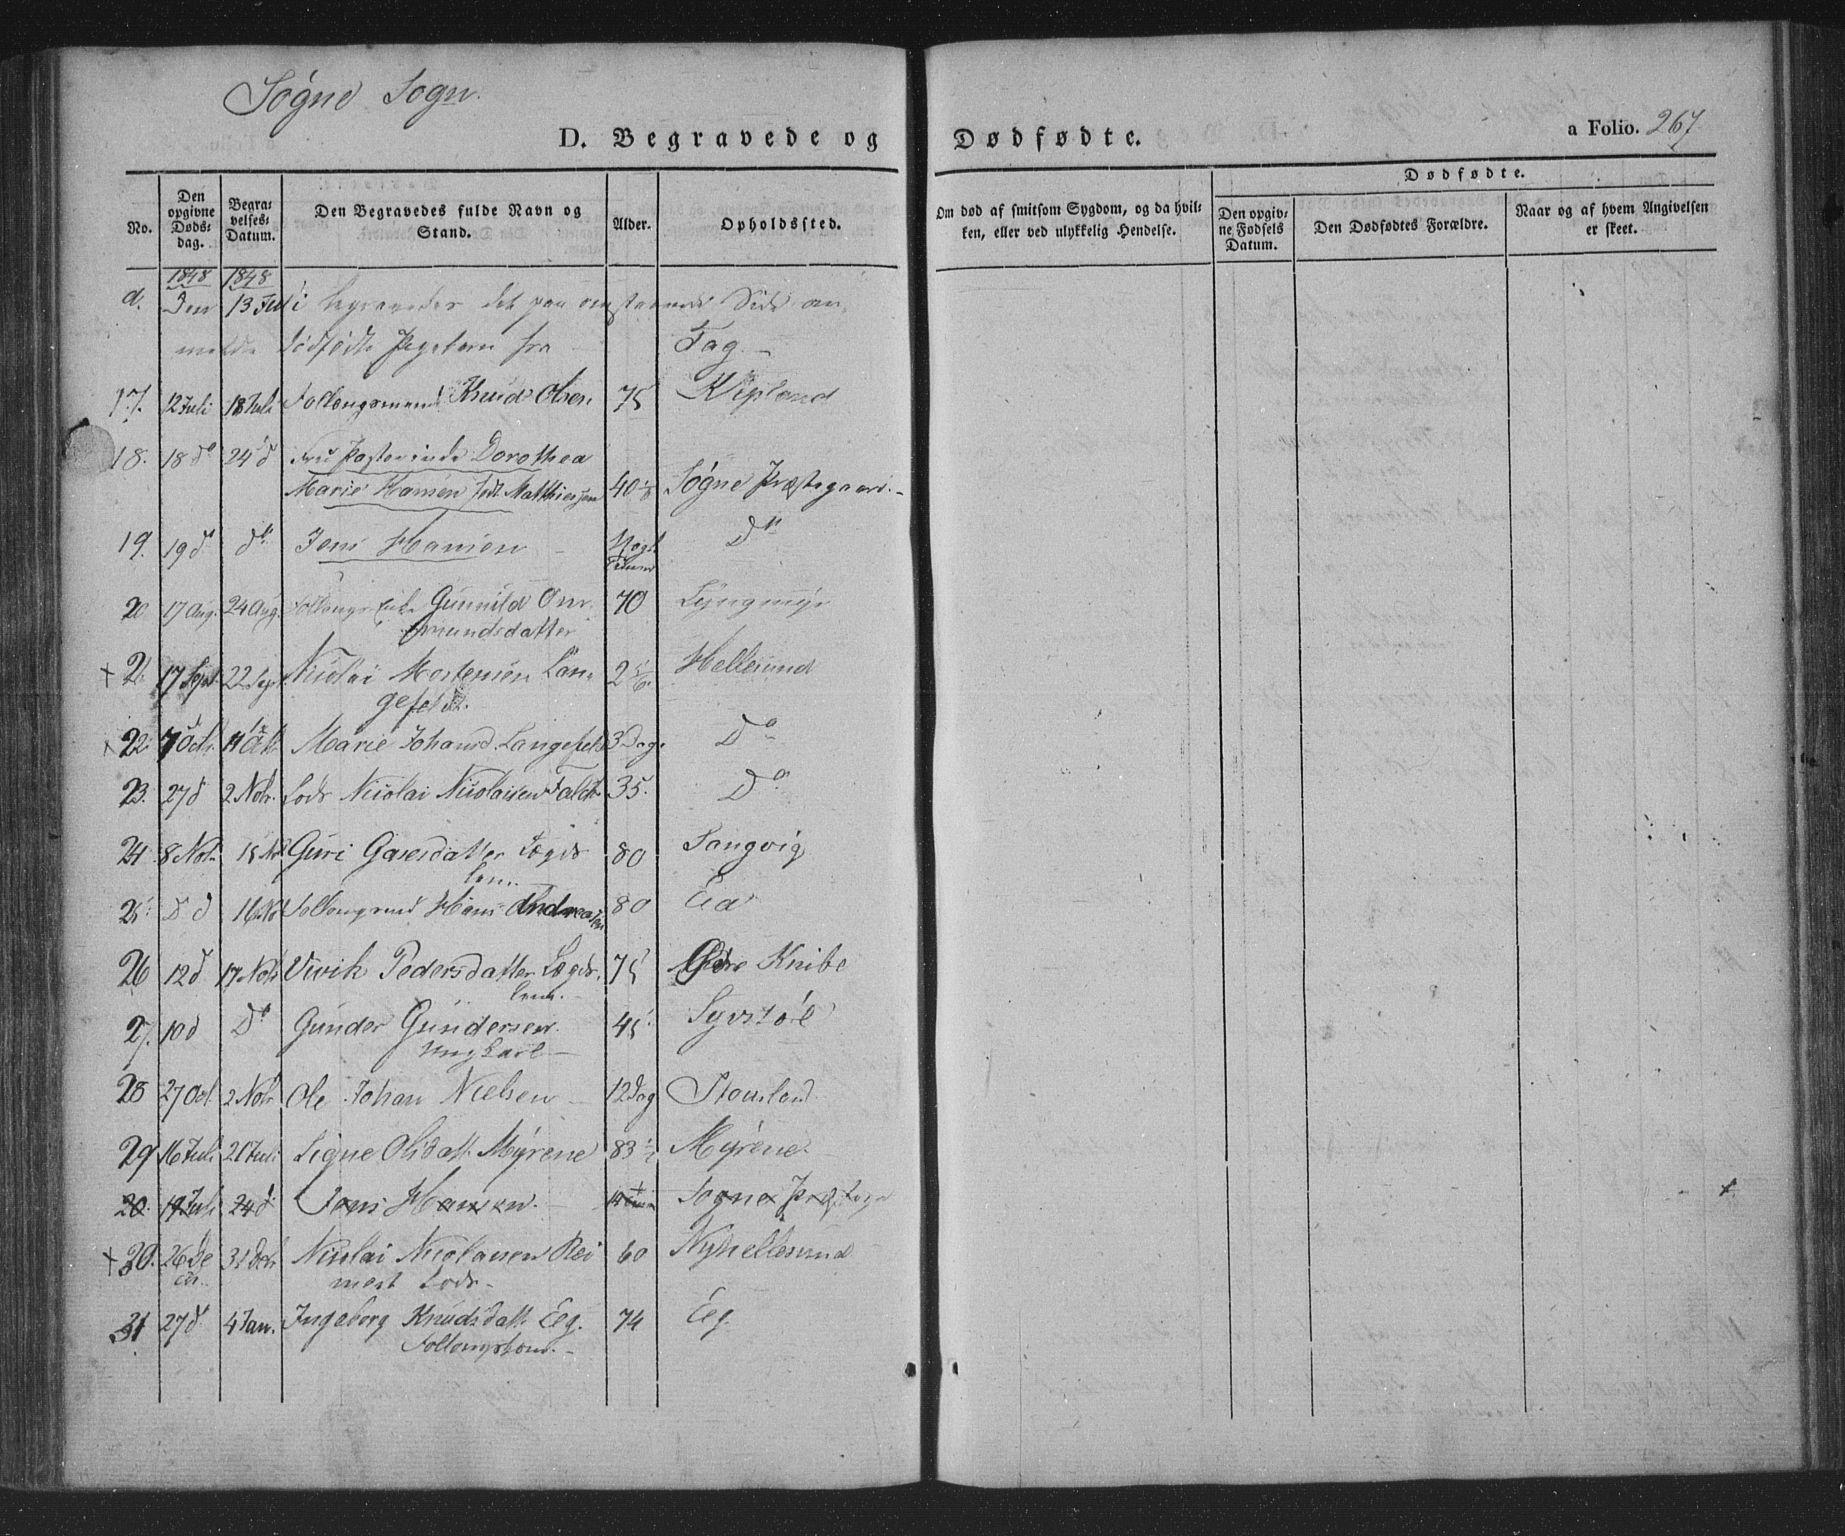 SAK, Søgne sokneprestkontor, F/Fa/Fab/L0009: Ministerialbok nr. A 9, 1838-1853, s. 267